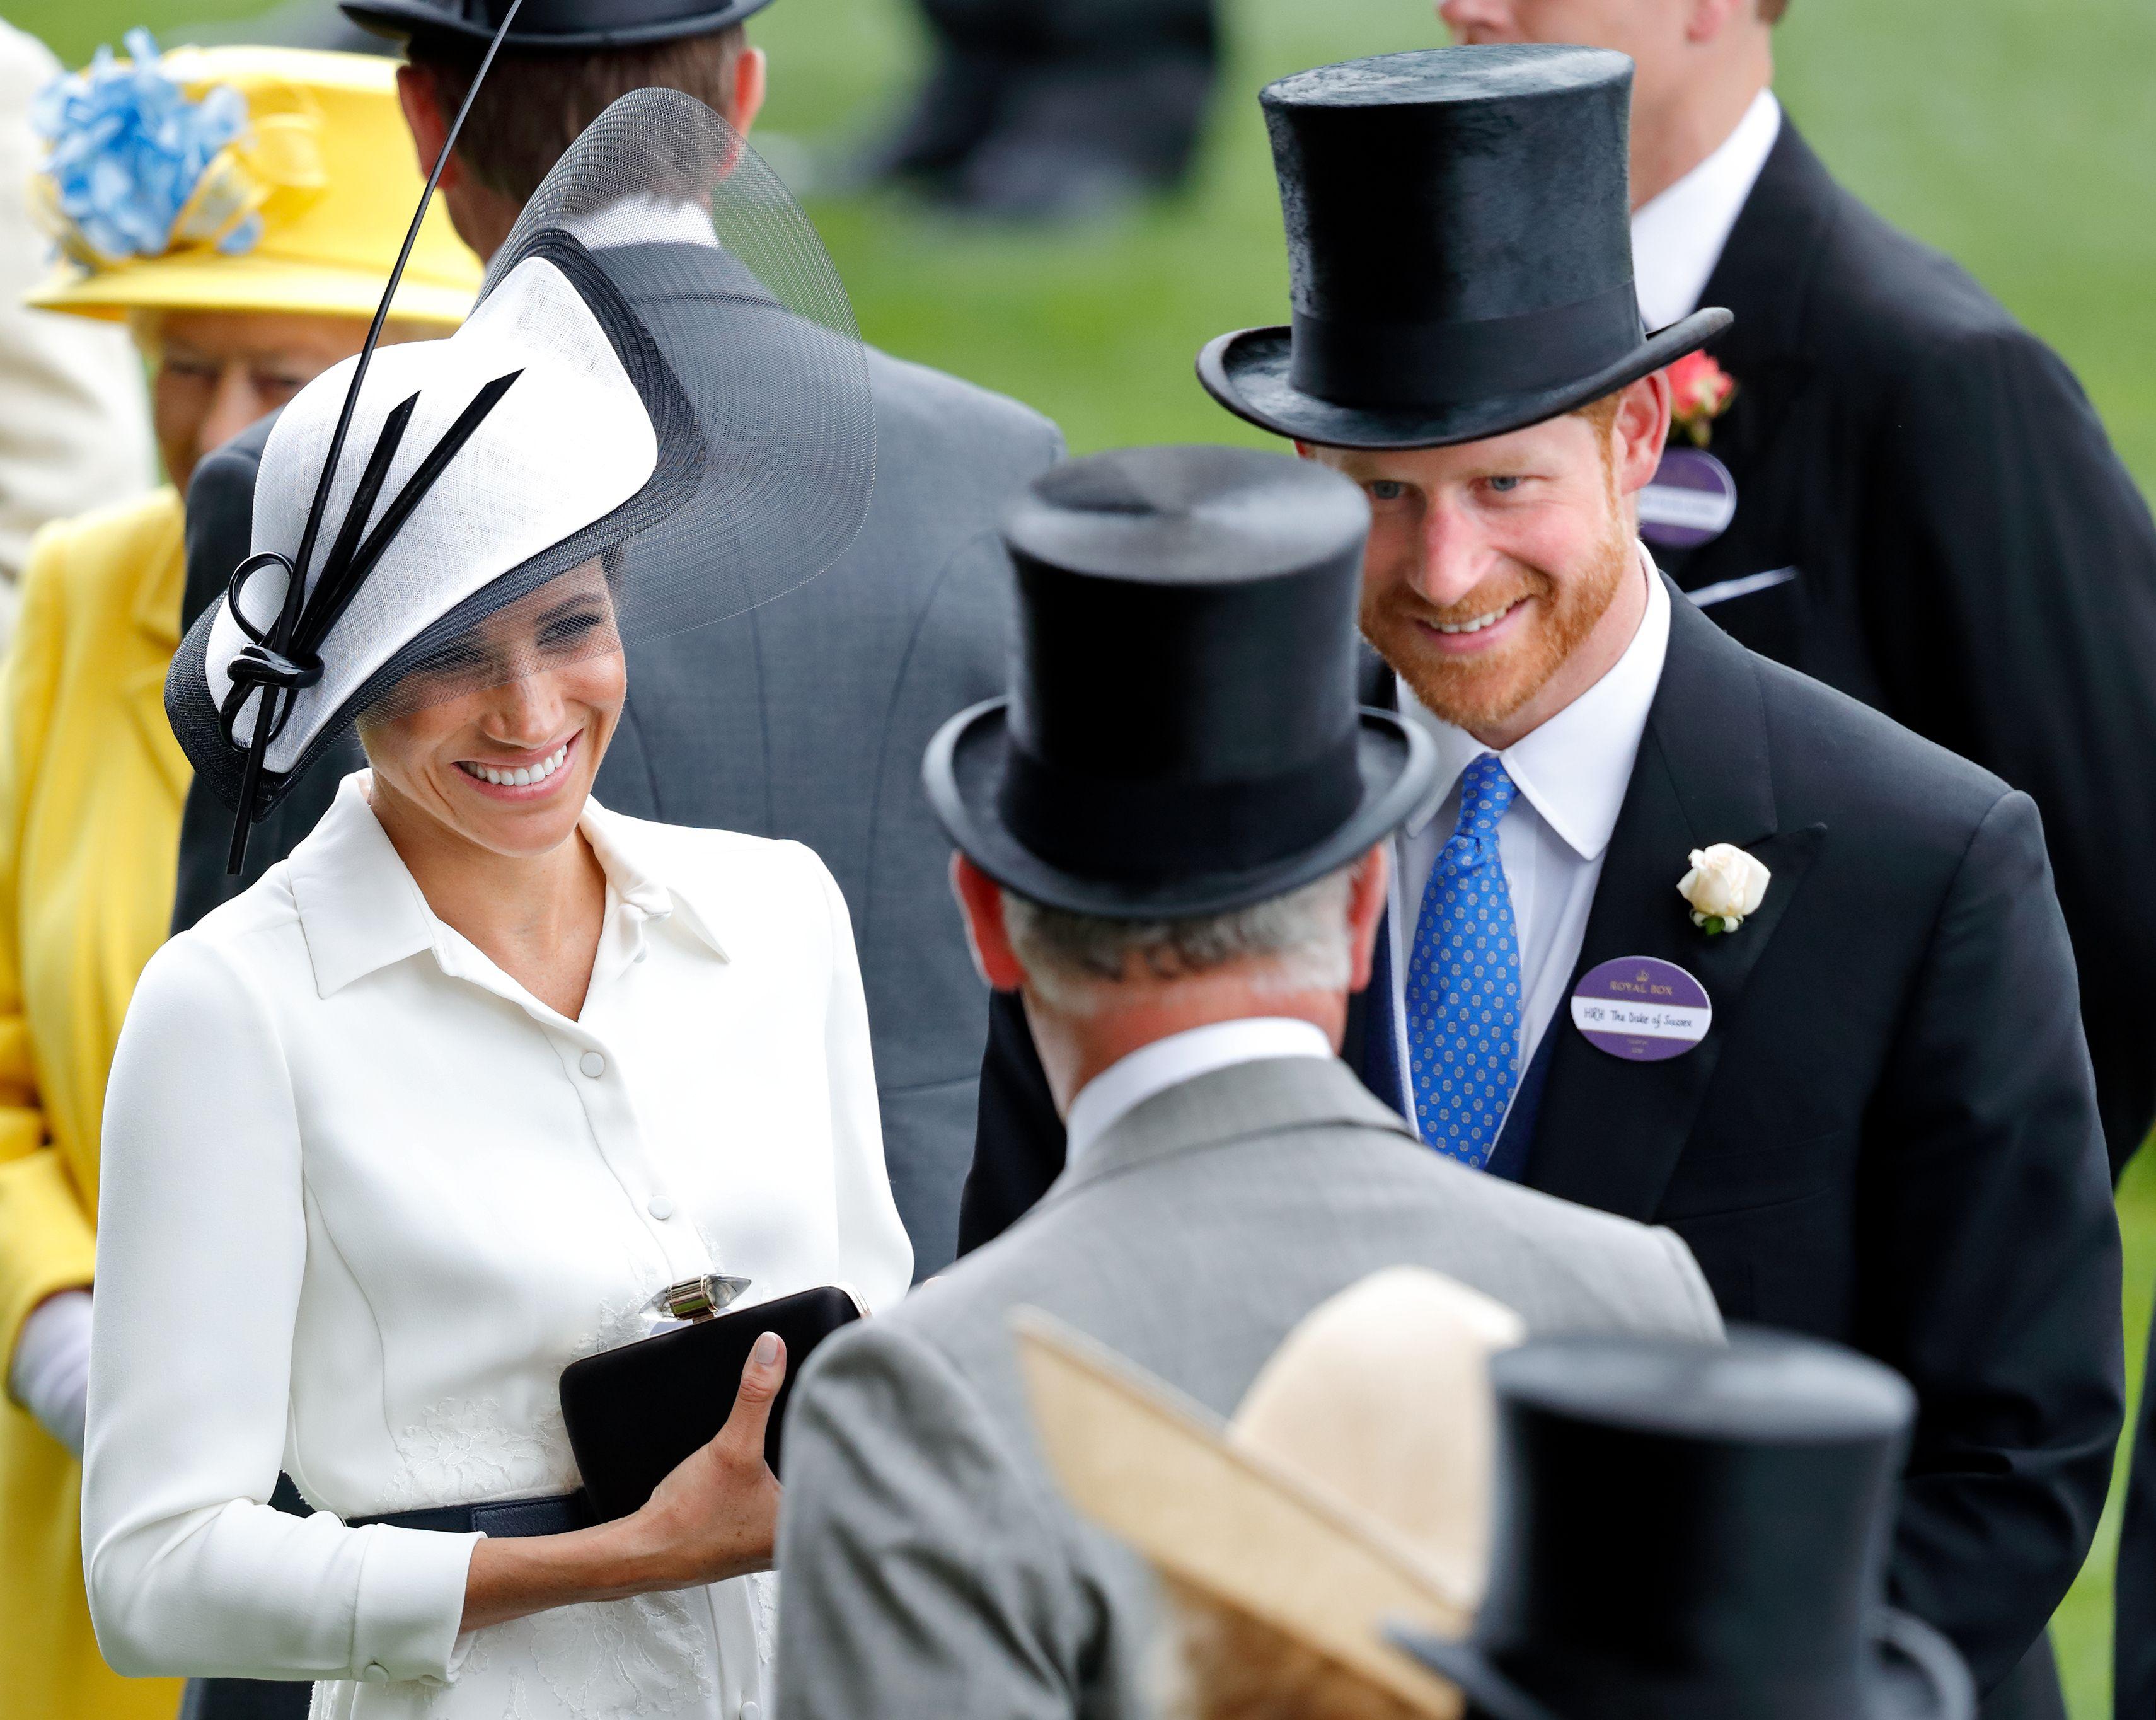 Prince Harry reveals the home habit that bewilders Meghan